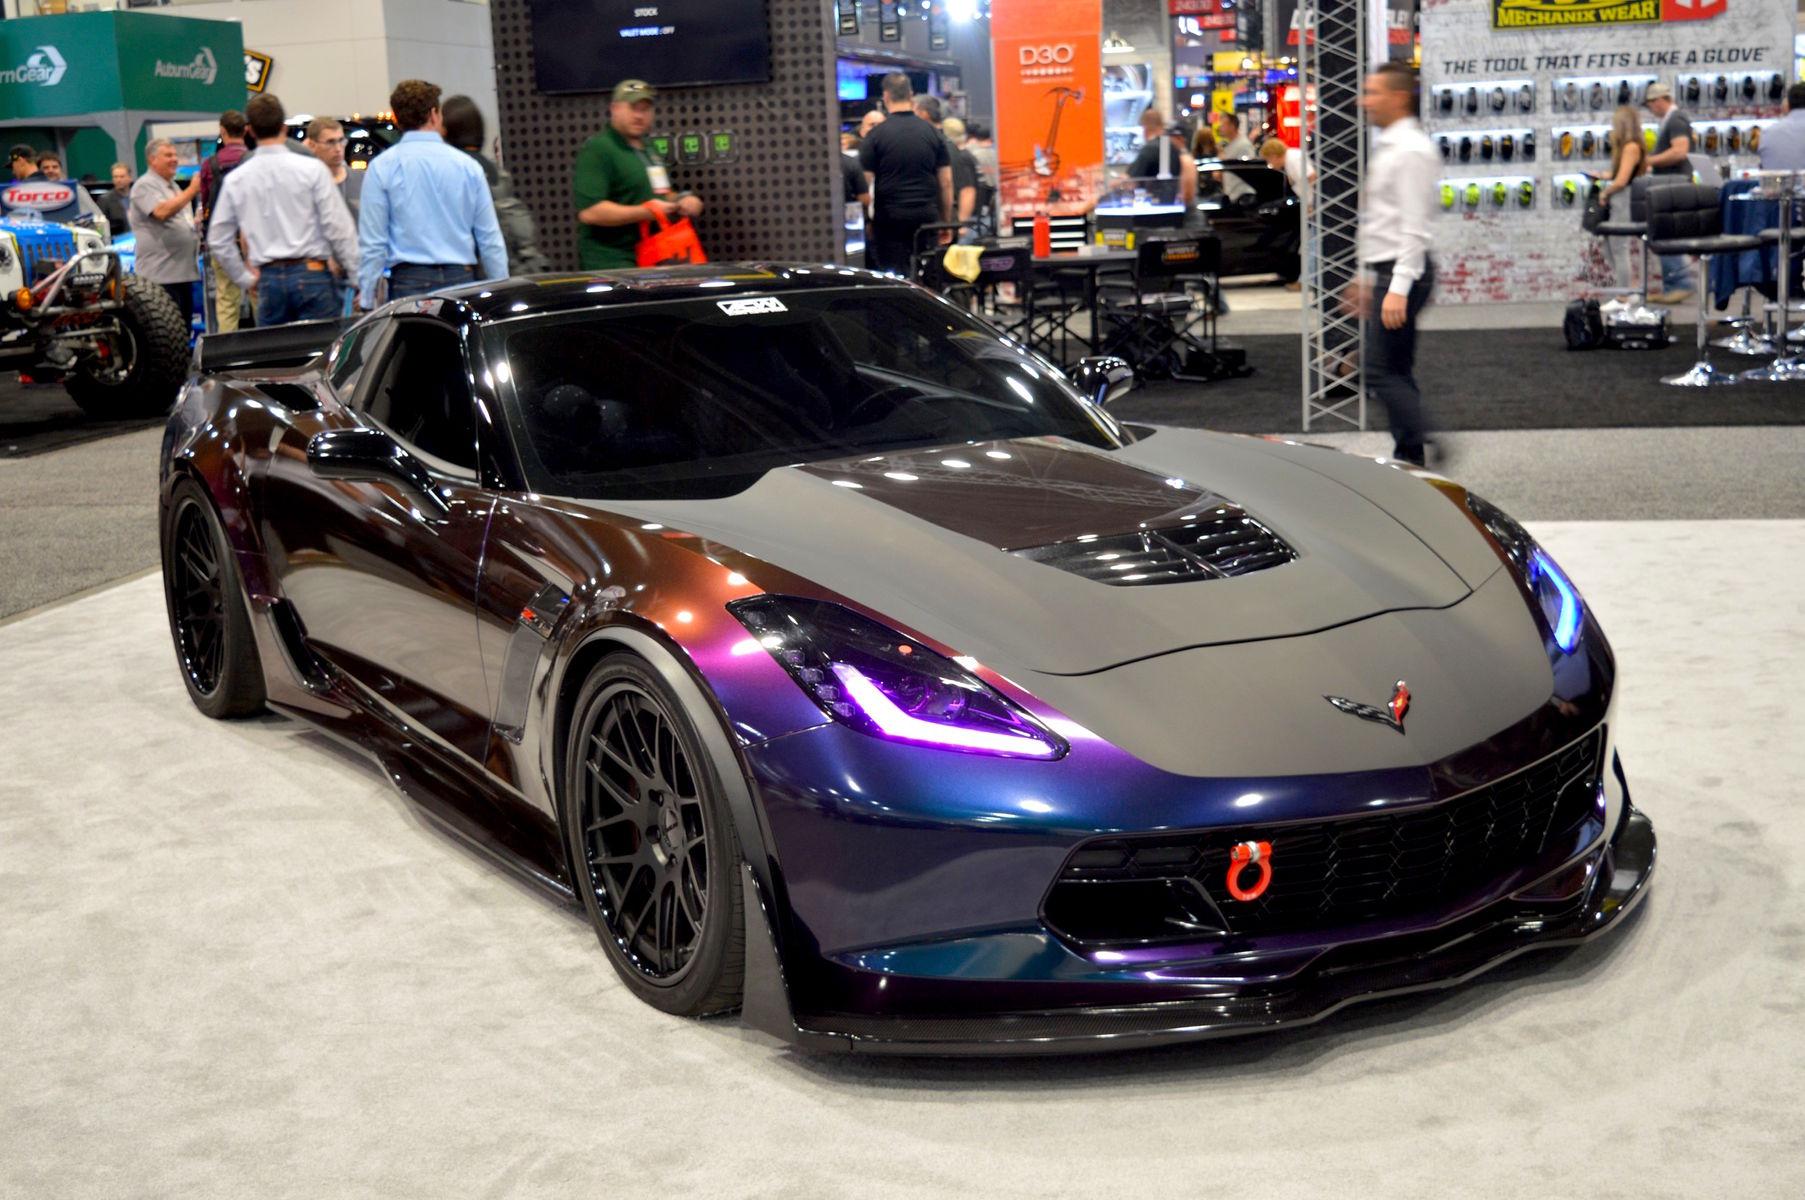 2015 Chevrolet Corvette Z06 | Atlanta Custom Wraps' C7 Corvette Z06 on Forgeline DE3C Concave Wheels